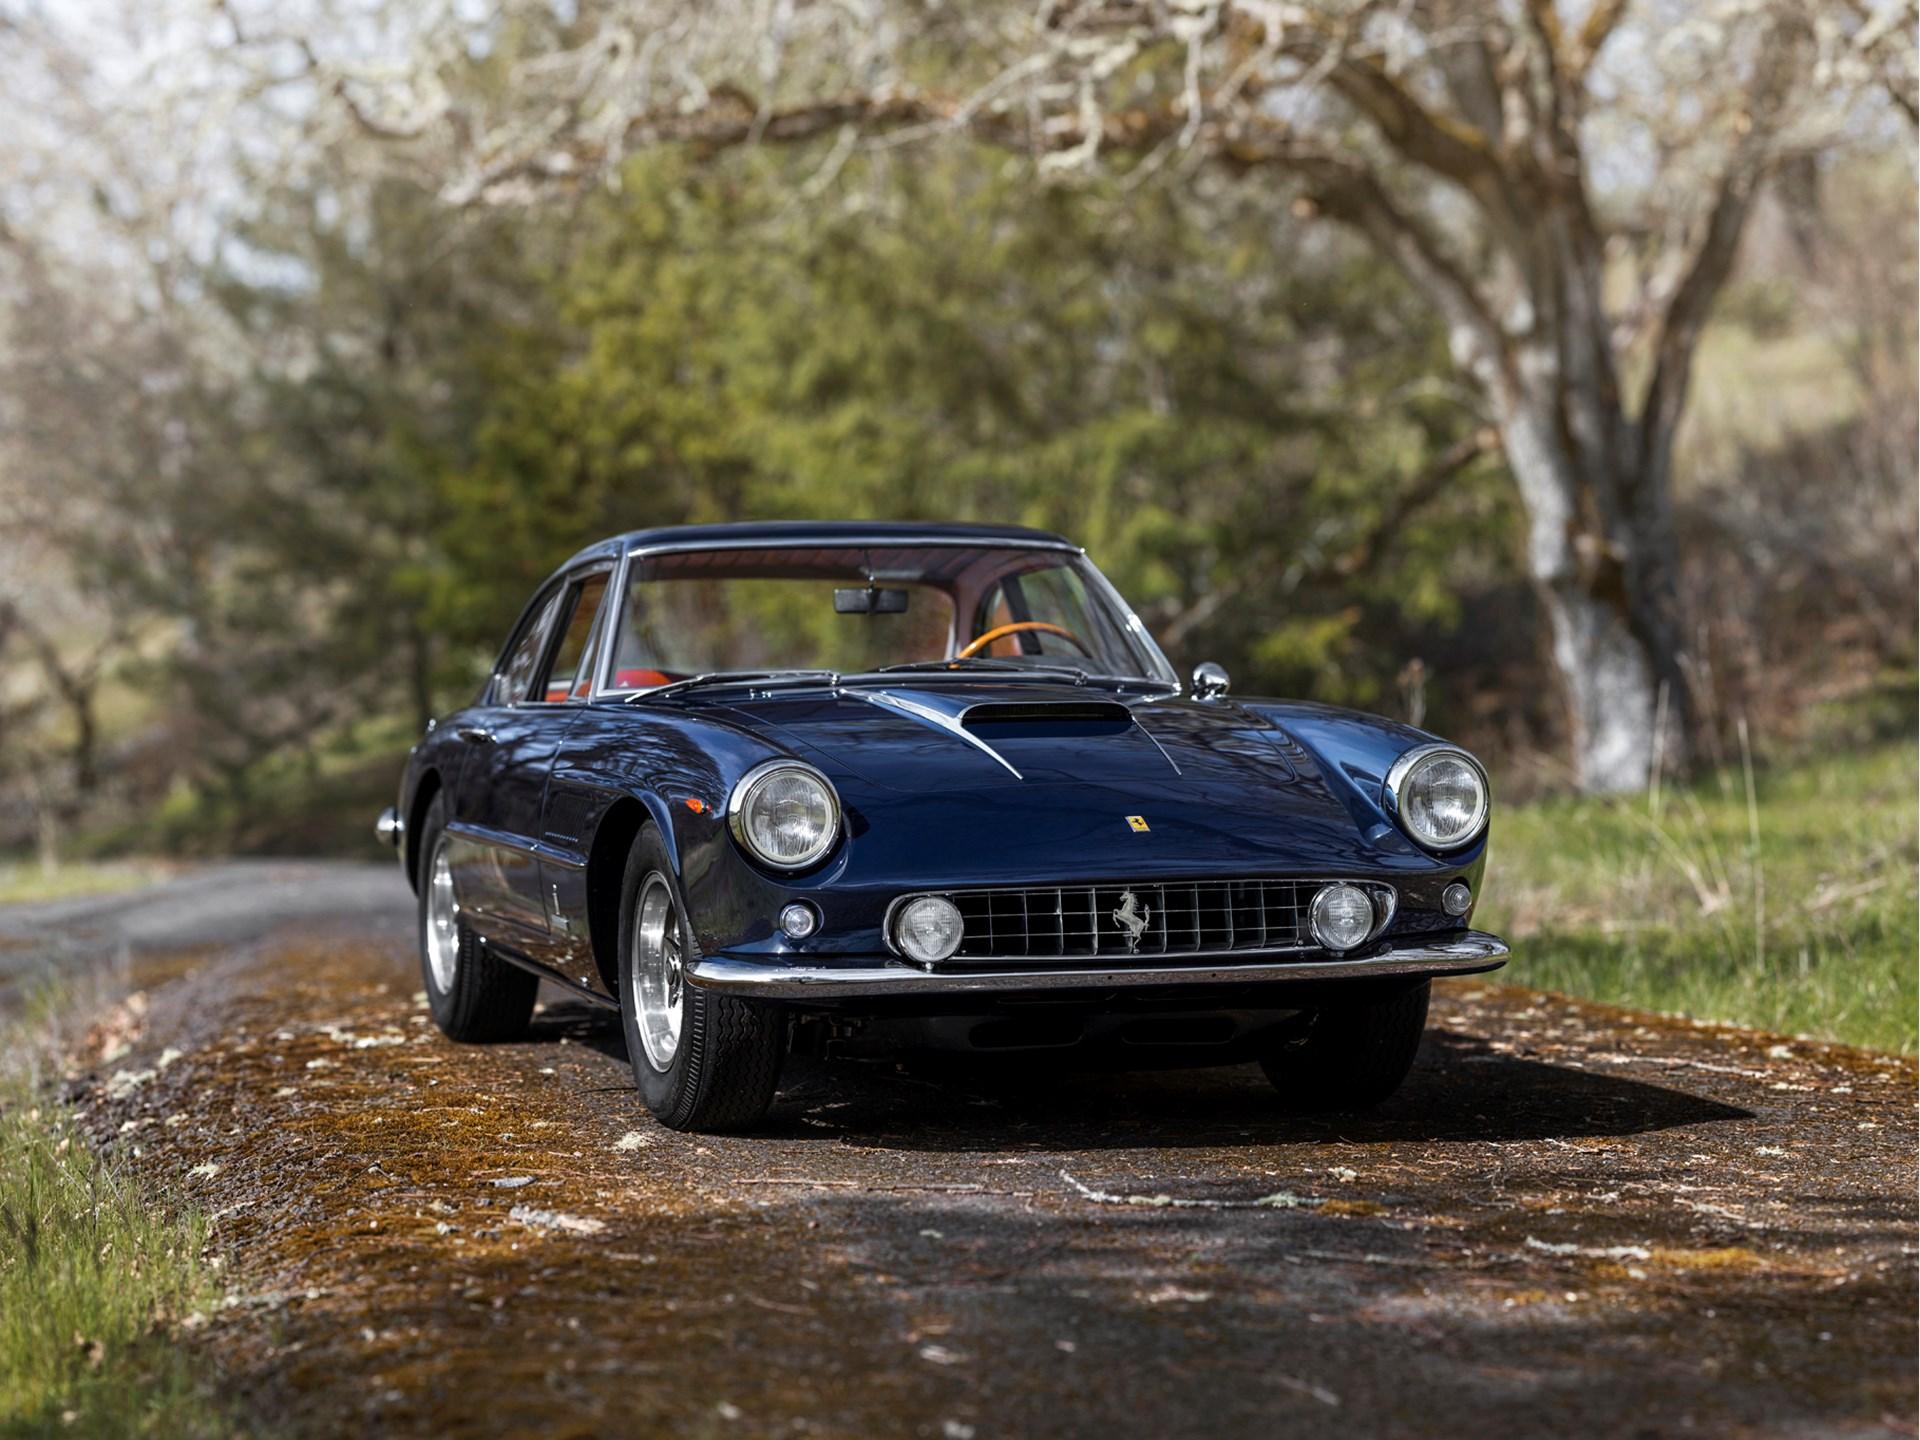 1961 Ferrari 400 Superamerica SWB Coupe Aerodinamico by Pininfarina